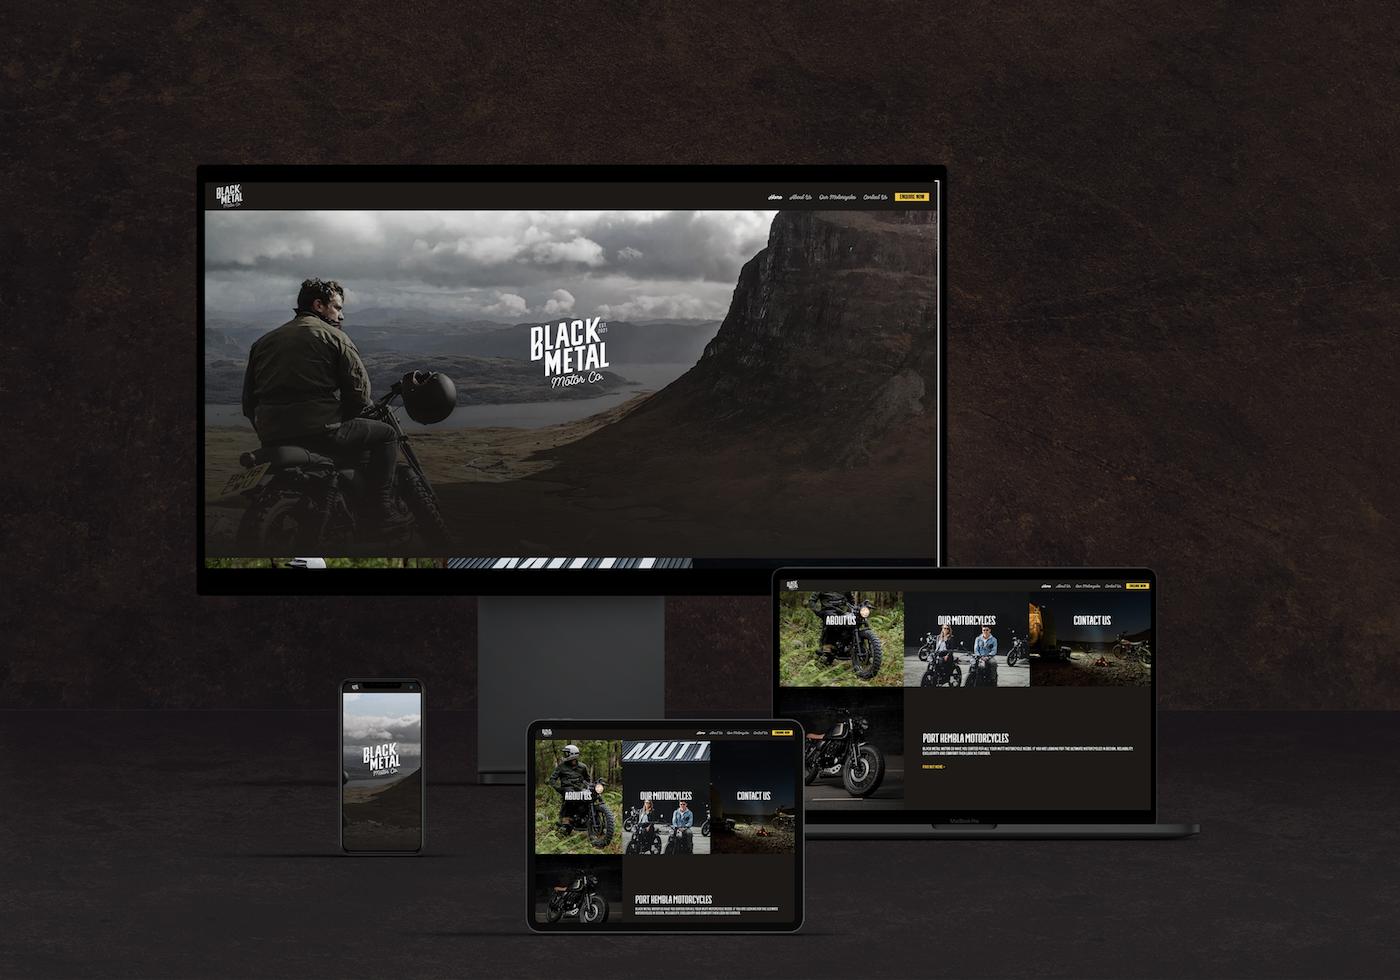 Web Design For Motorcycle Retailer